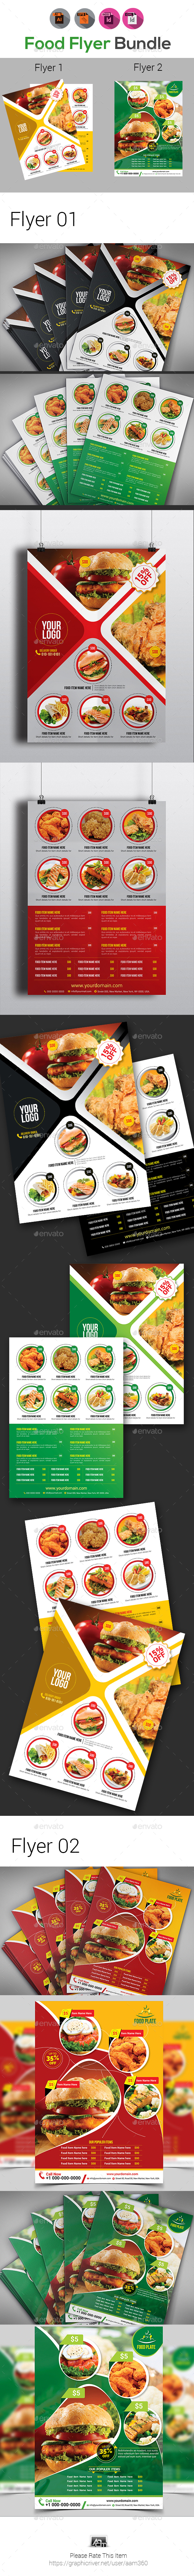 Food Flyer Bundle Templates